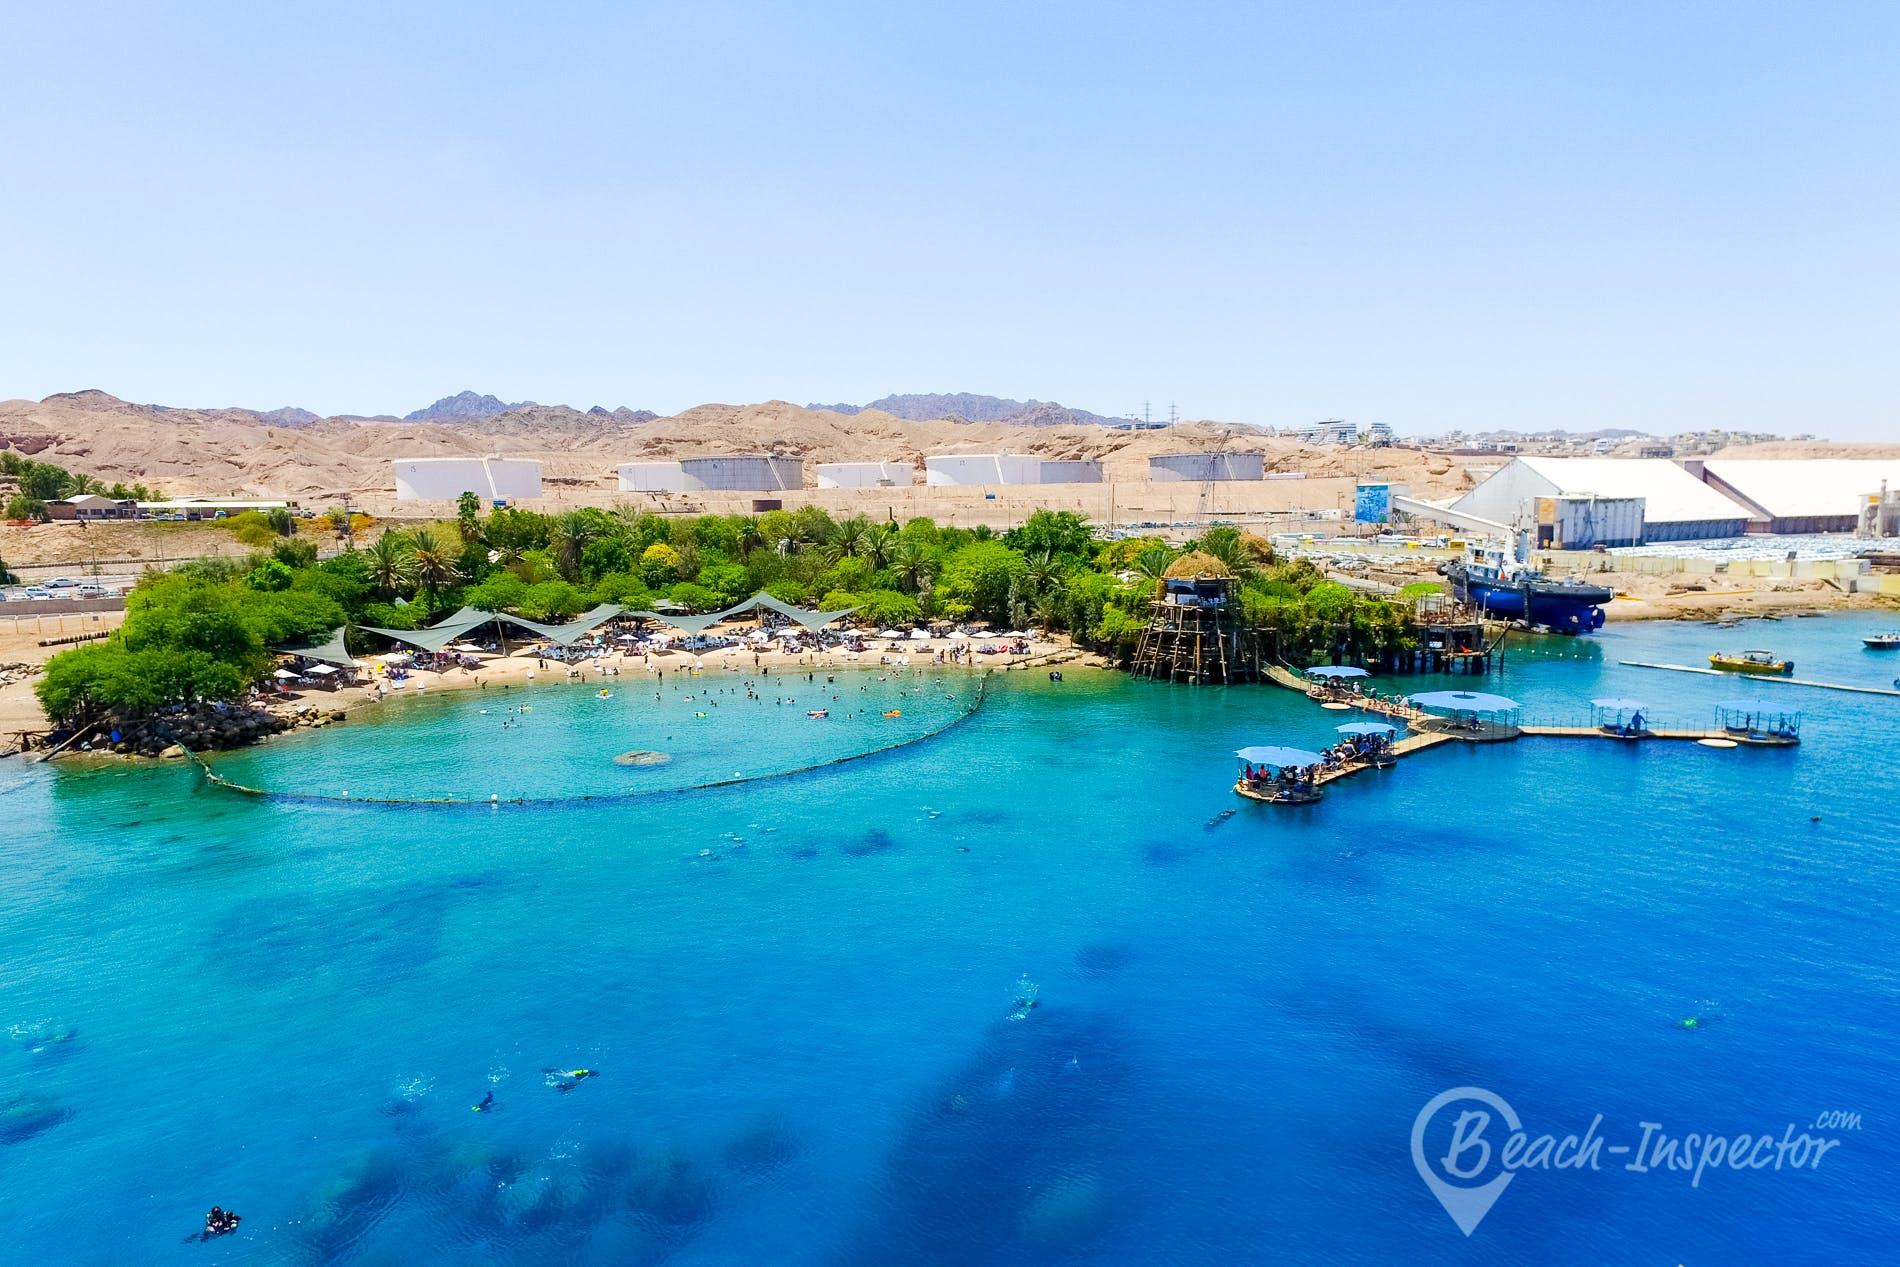 Playa Dolphin Reef Beach, Israel, Israel